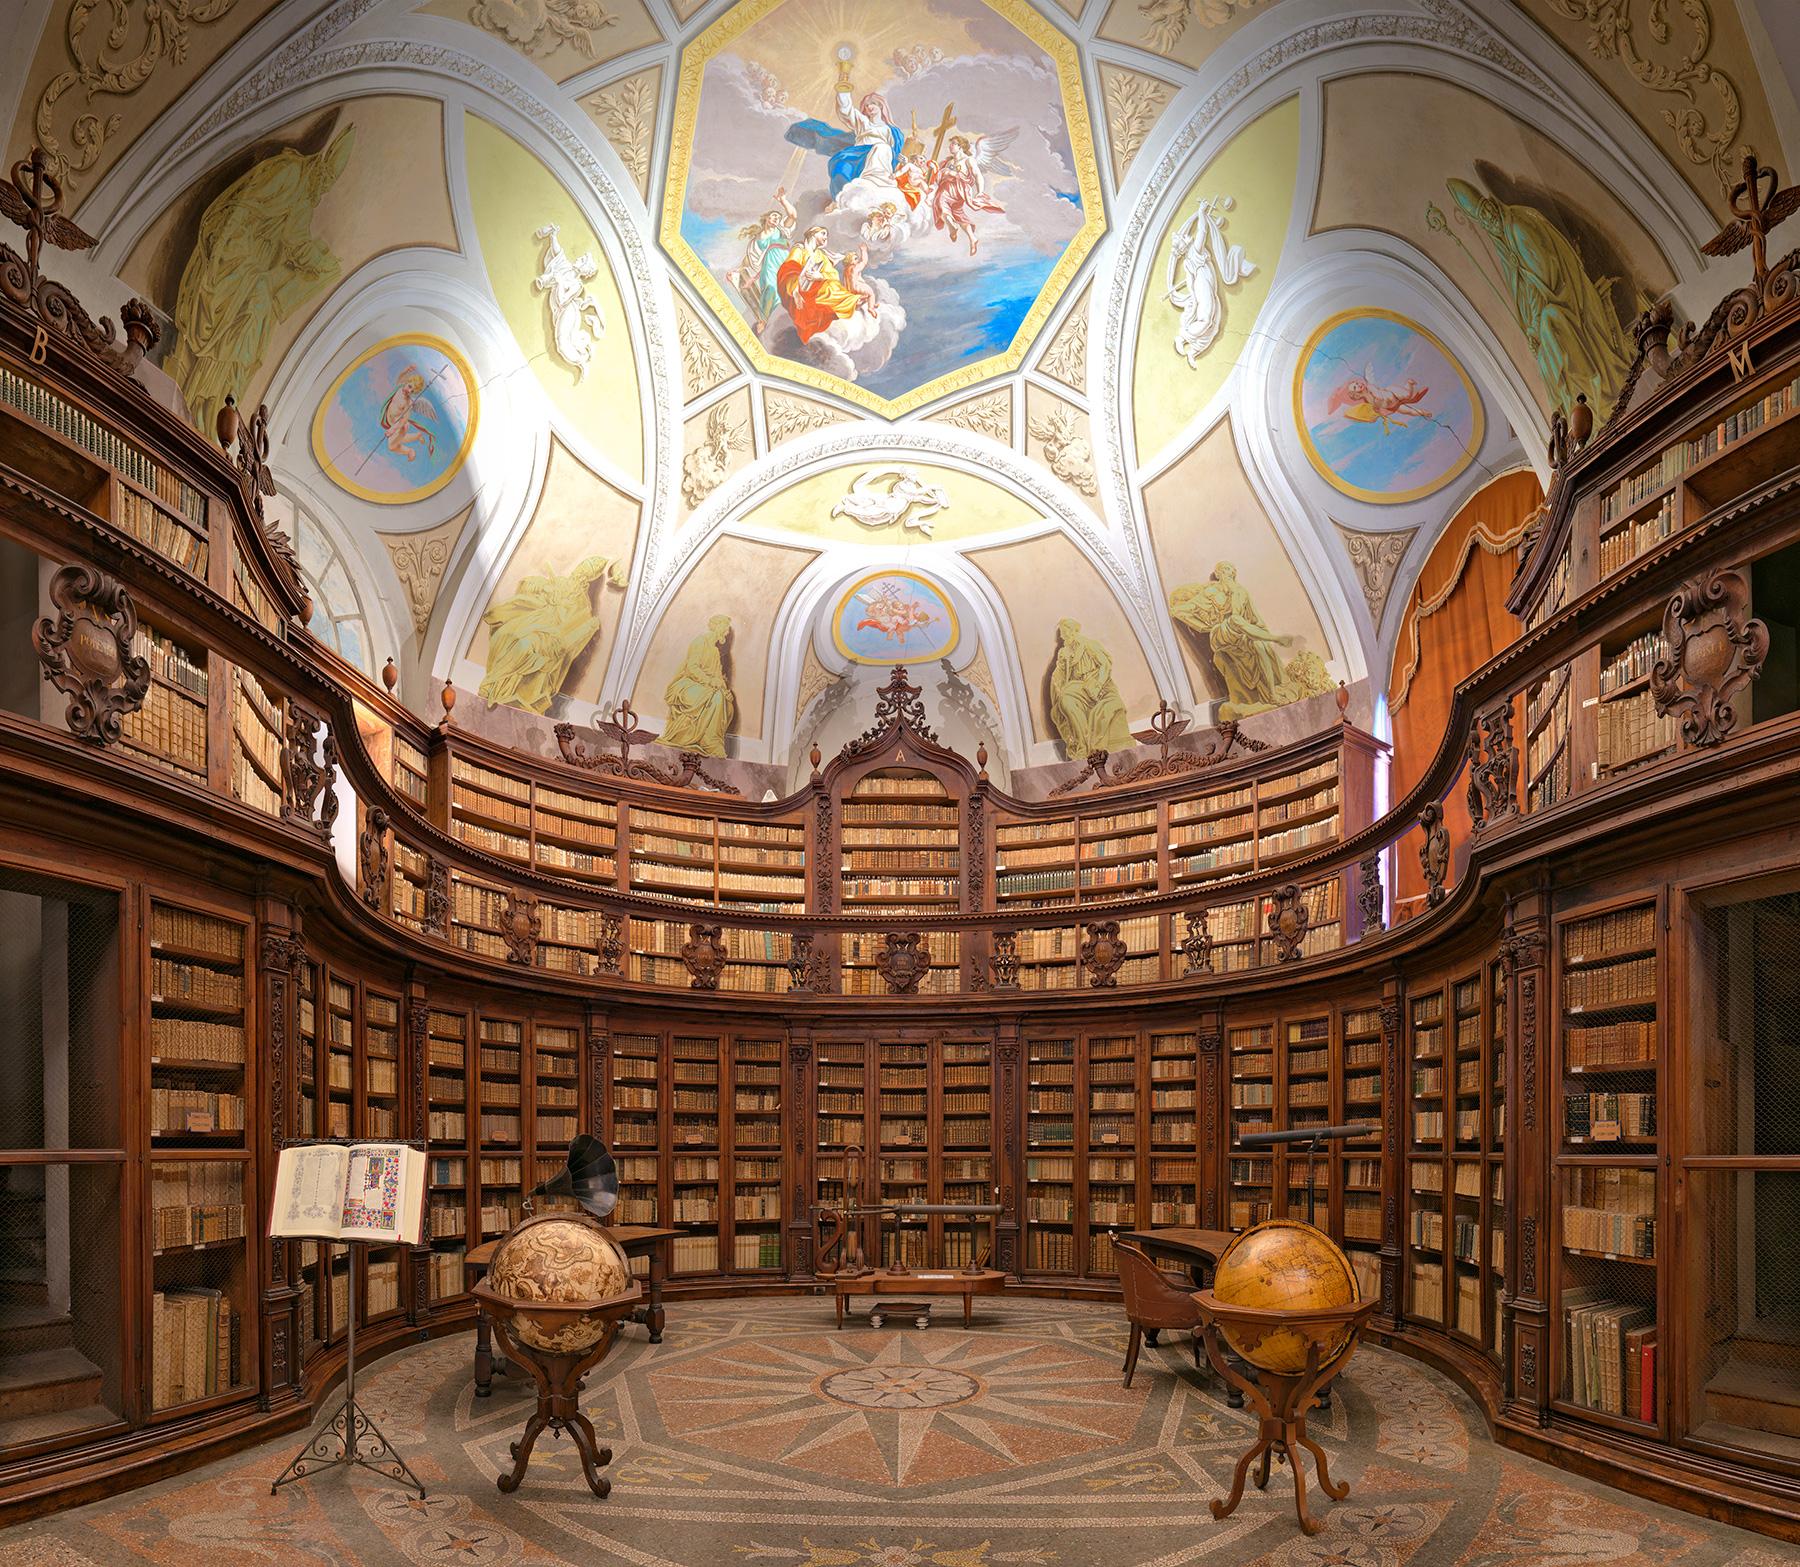 Medieval Library by modator in Regular Member Gallery